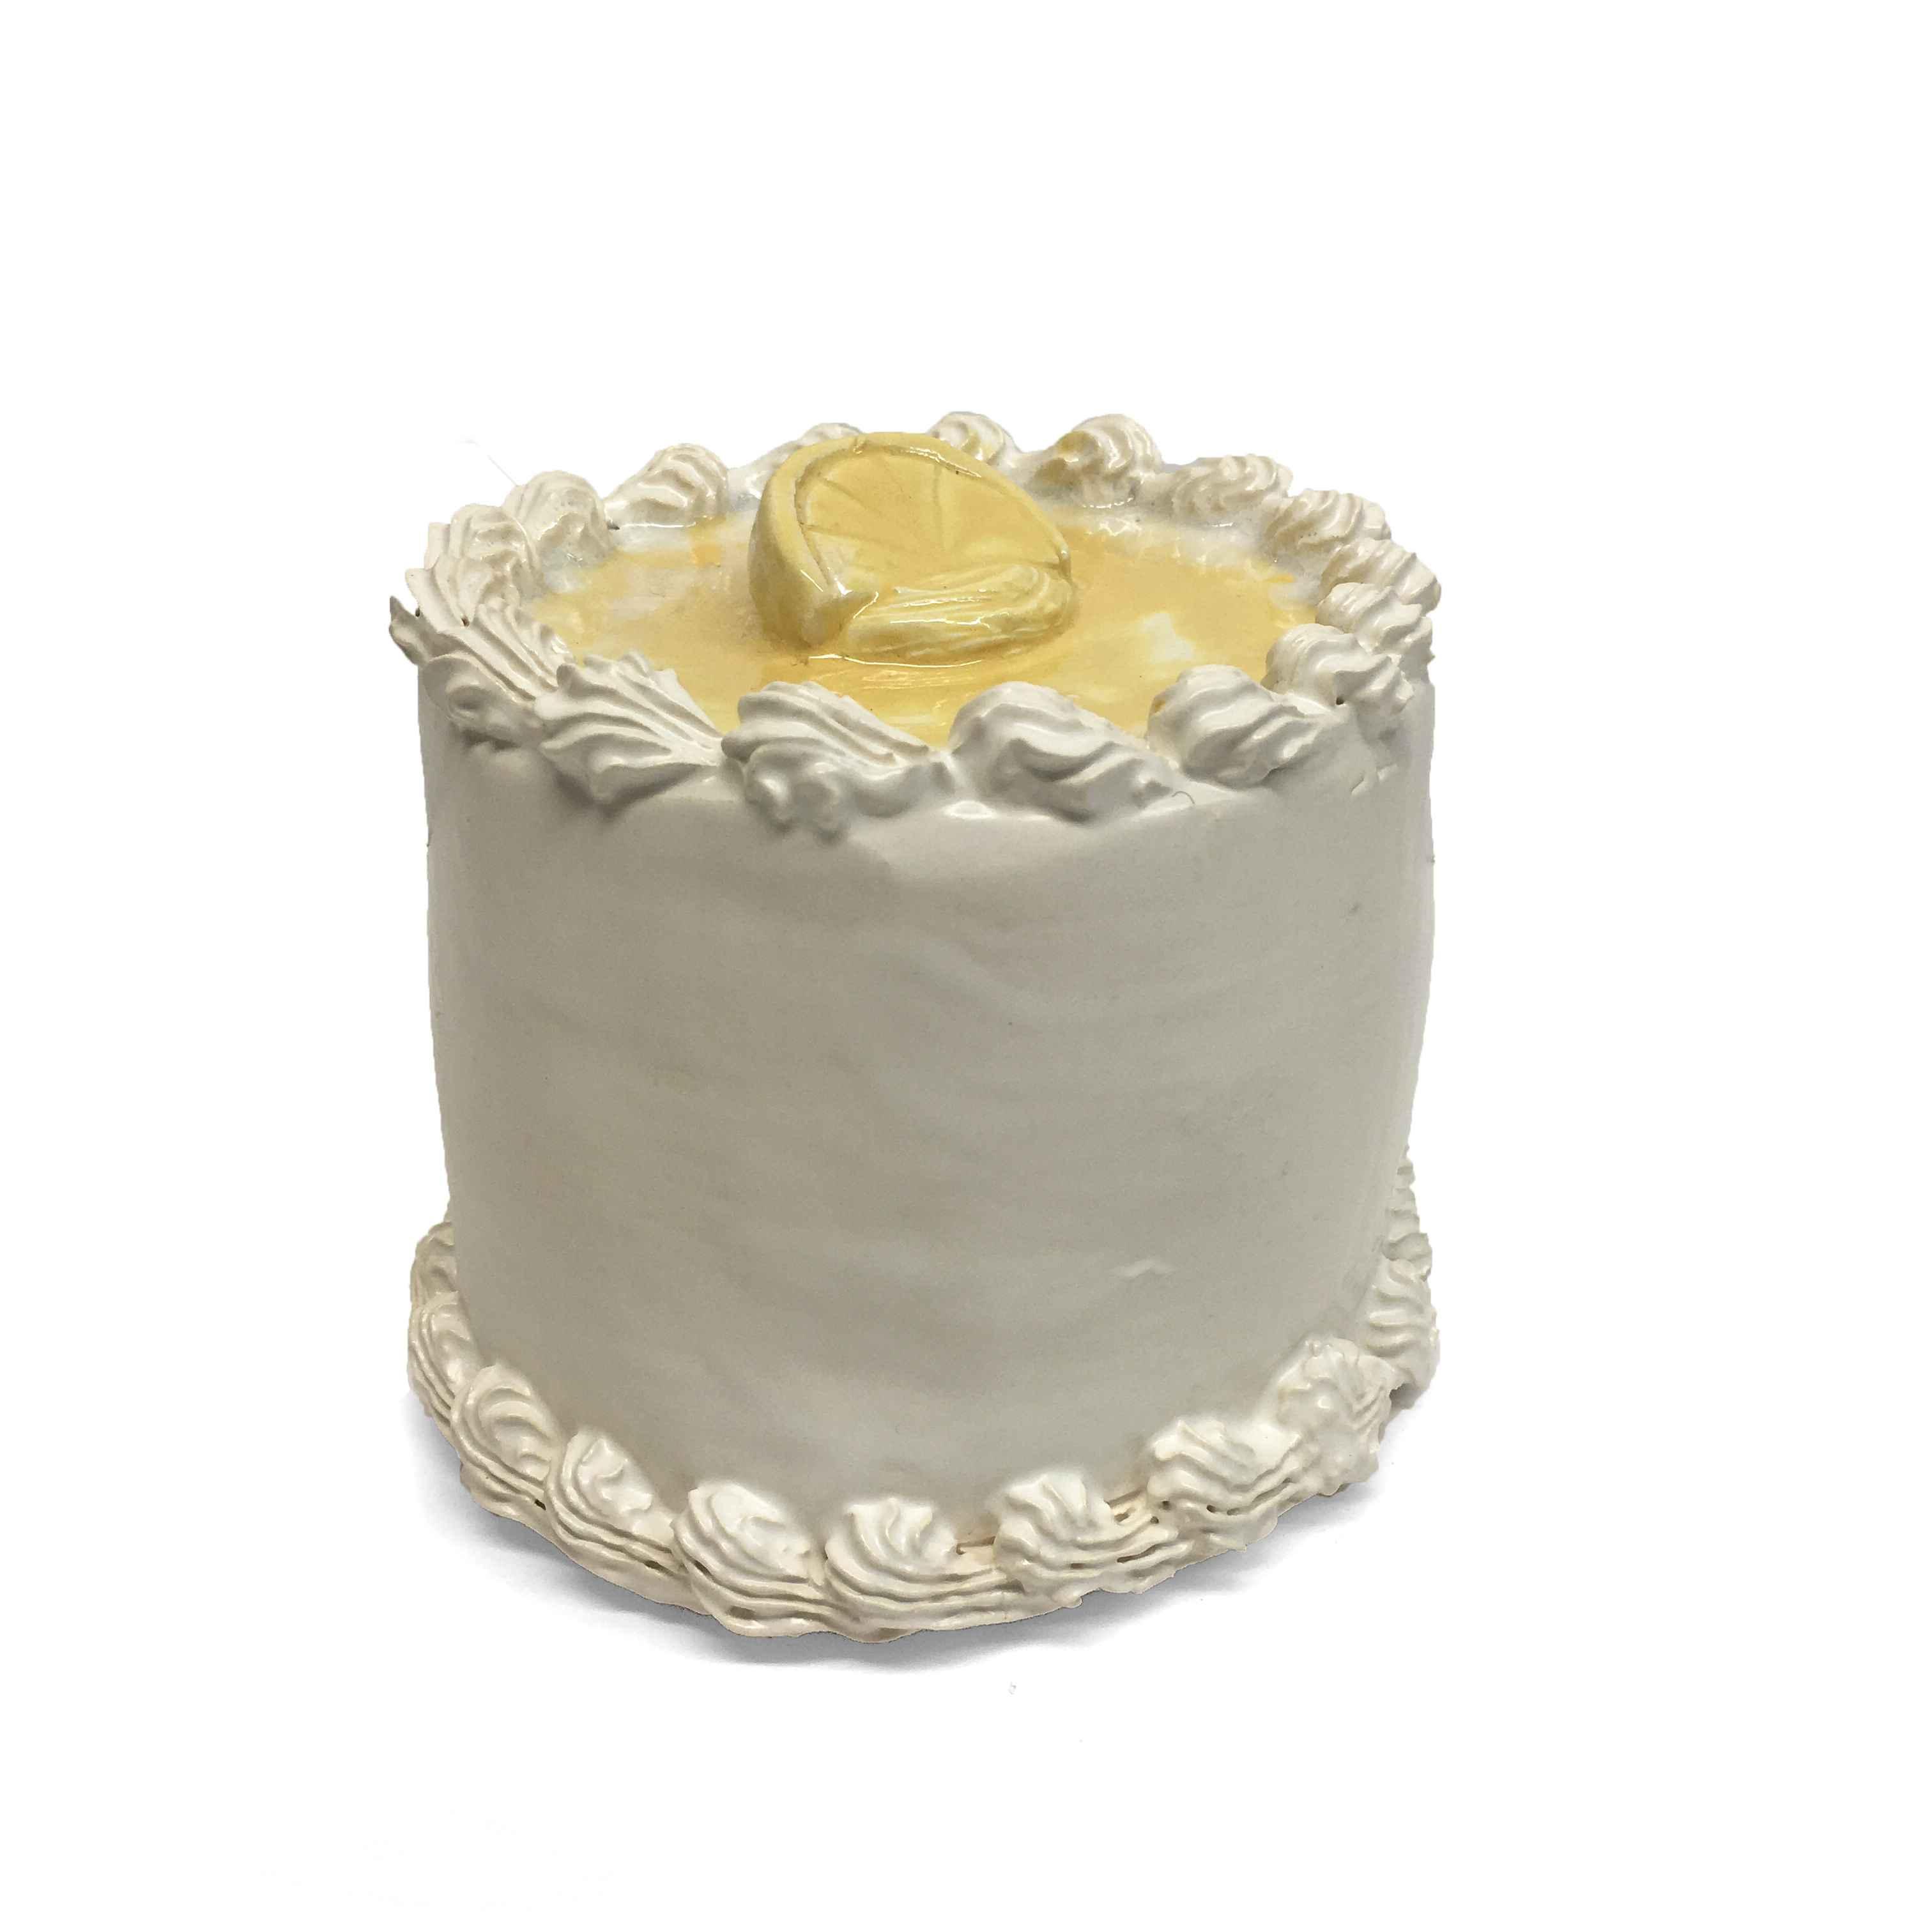 Lemon Topped Cake  by  Jeff Nebeker